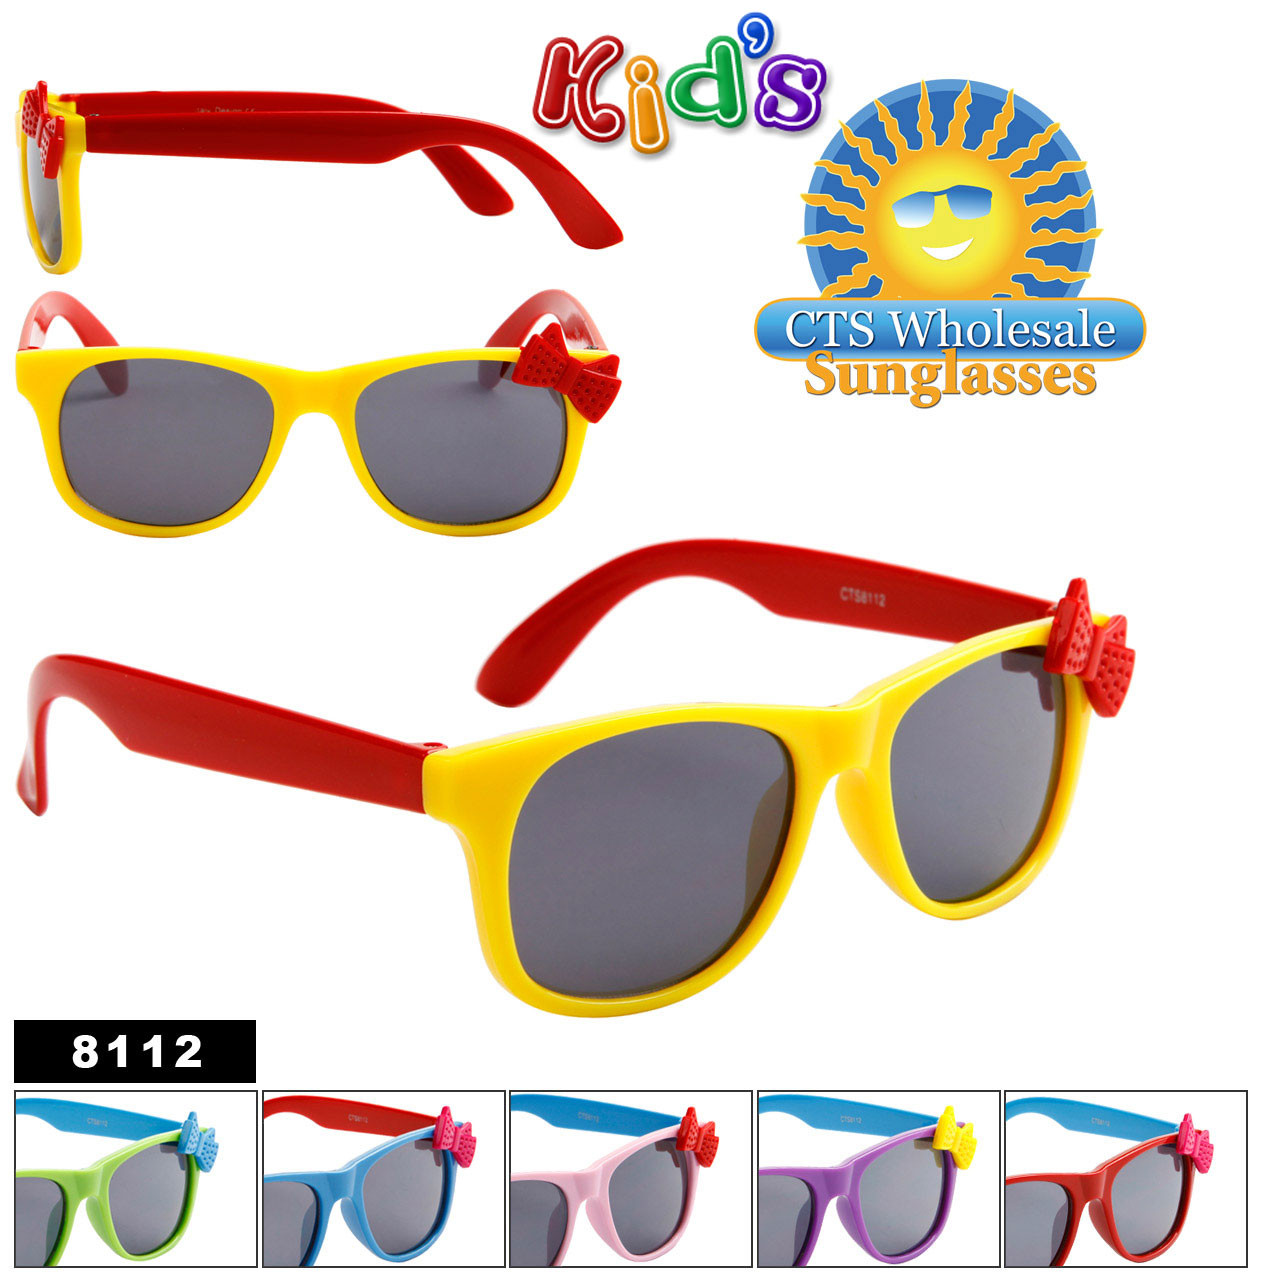 Kid's California Classics Sunglasses with Bows 8112